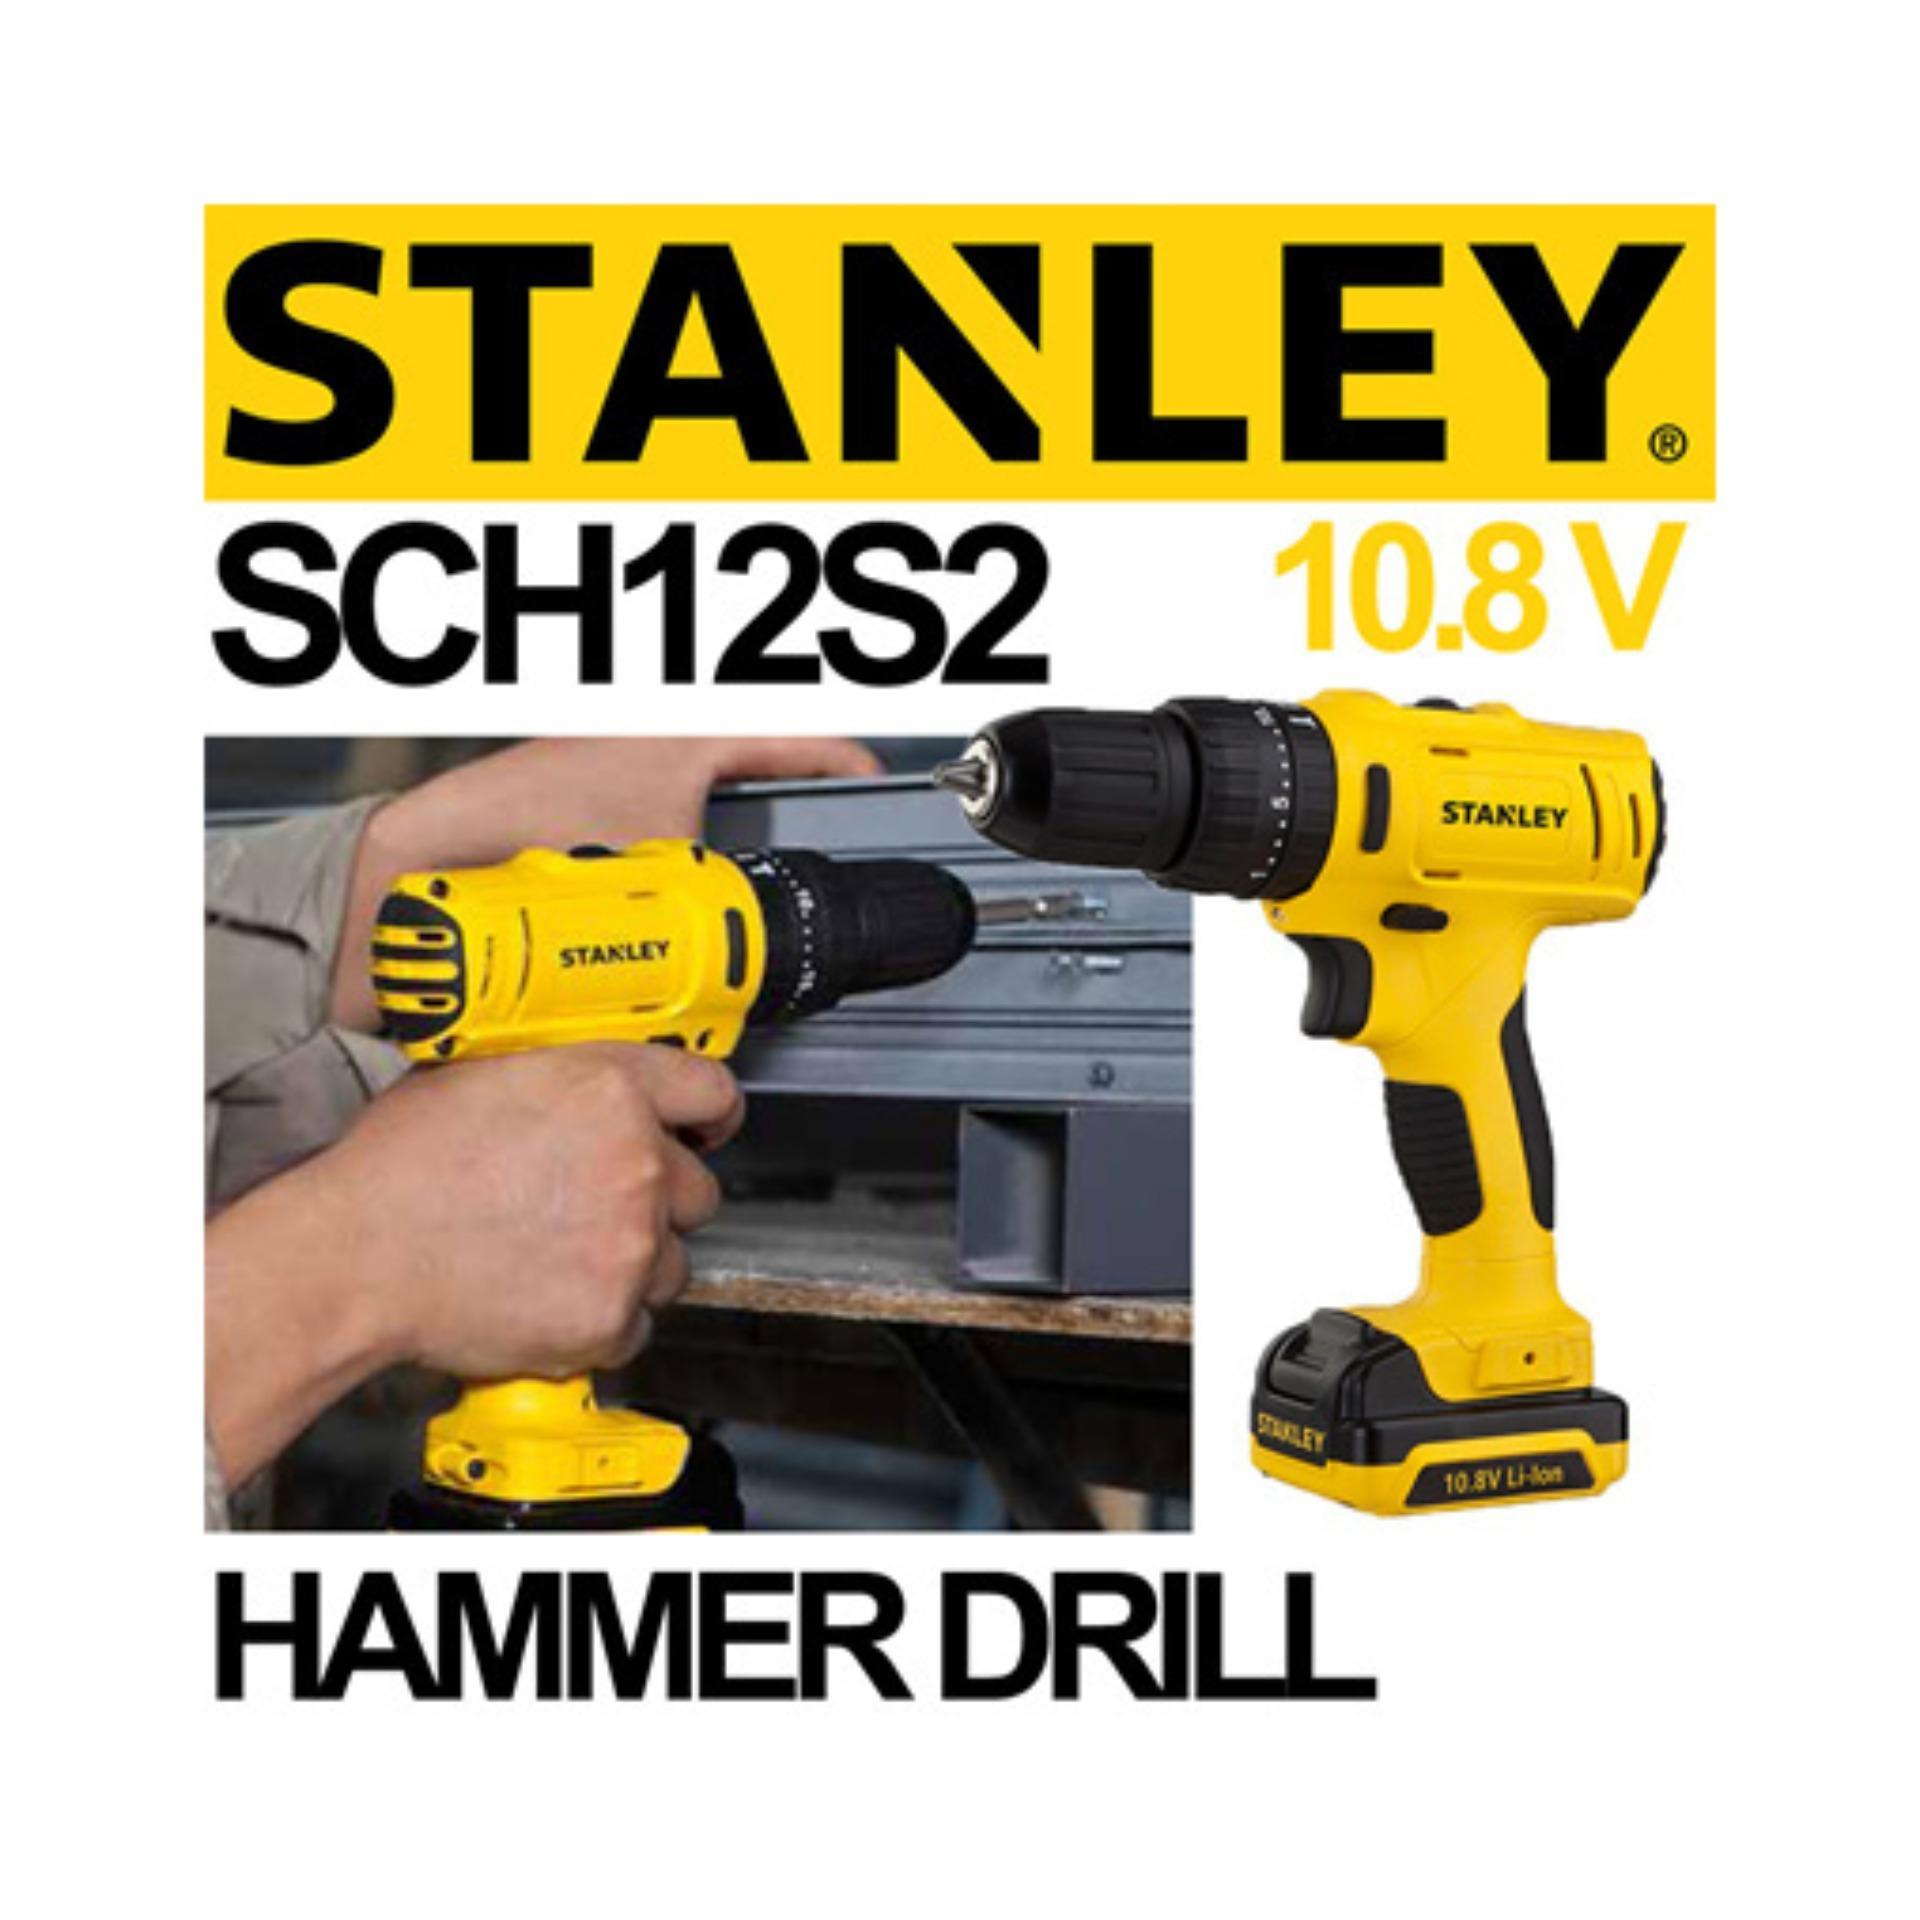 Run 13mm Power Impact Drill Mesin Bor Beton Cek Harga Terkini Dan Baterai 10mm Aeg Bsb12c2li 2 Detail Gambar Tembok Cordless Hammer Stanley Sch12s2 Sch 12